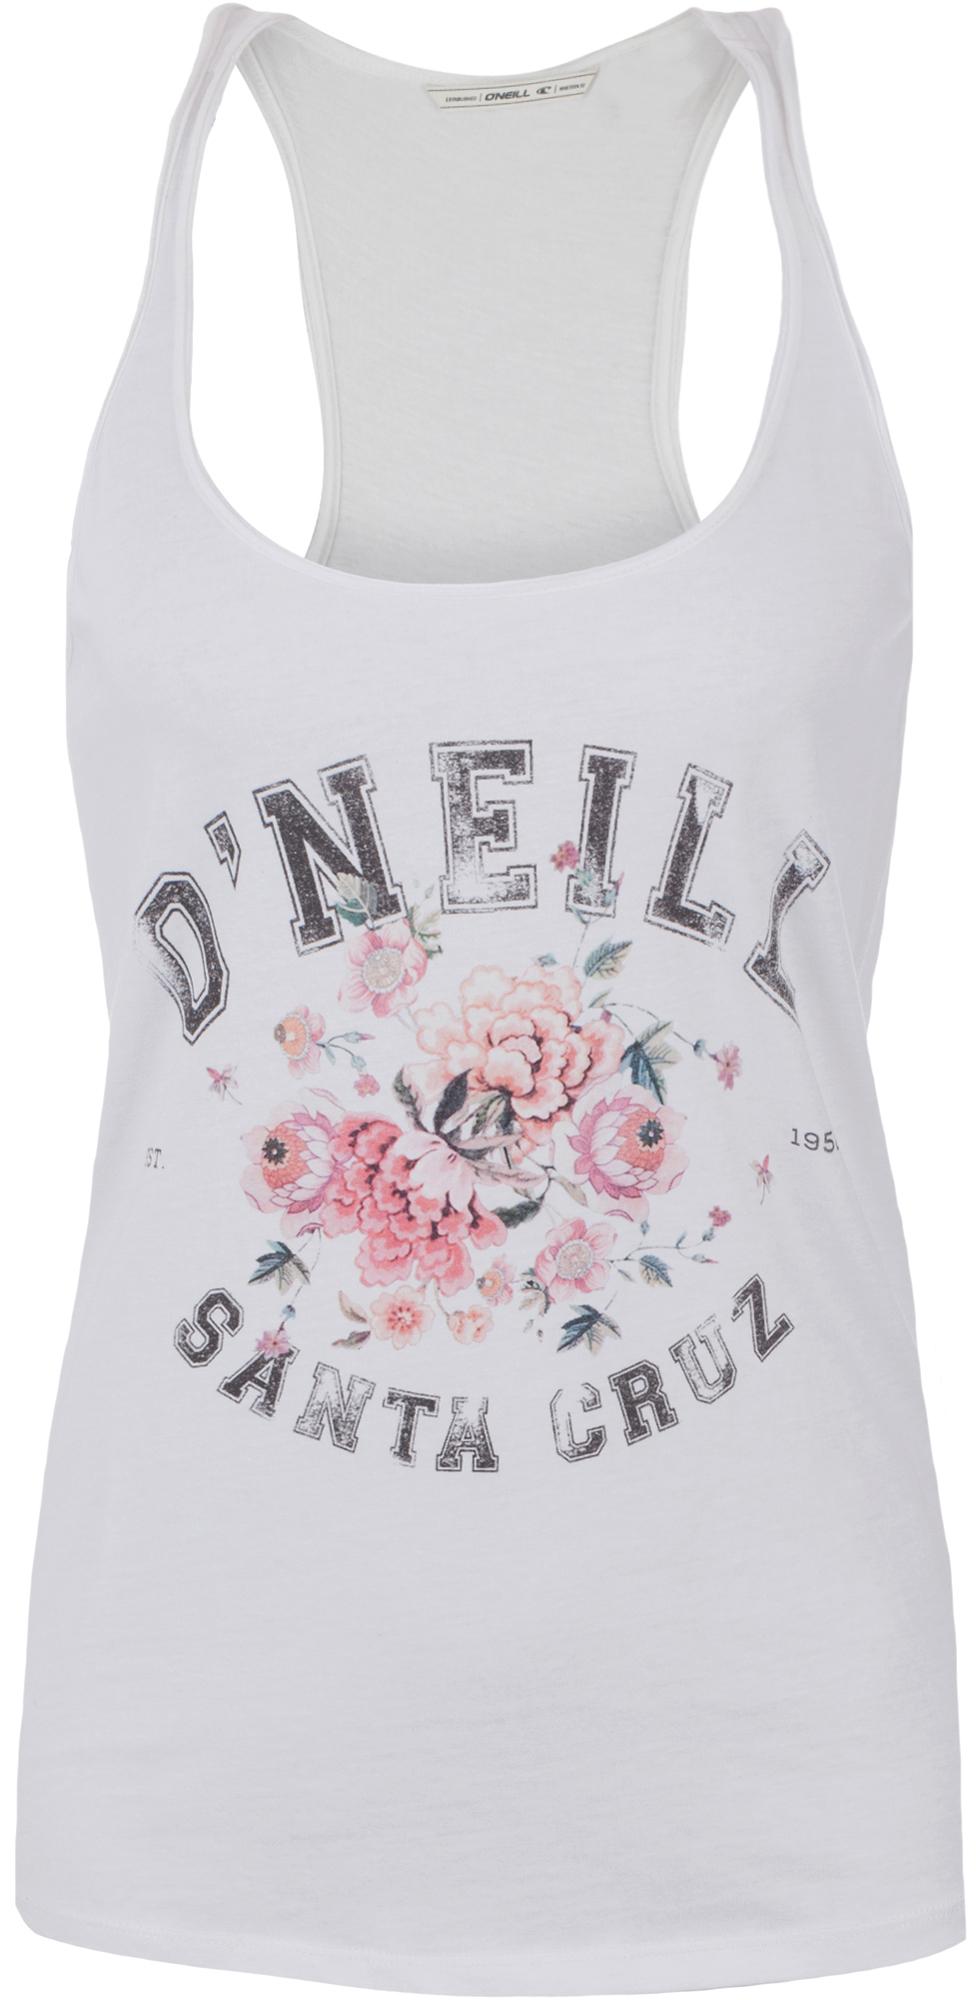 O'Neill Майка женская O'Neill Santa Cruz Garden o neill шорты мужские o neill complex